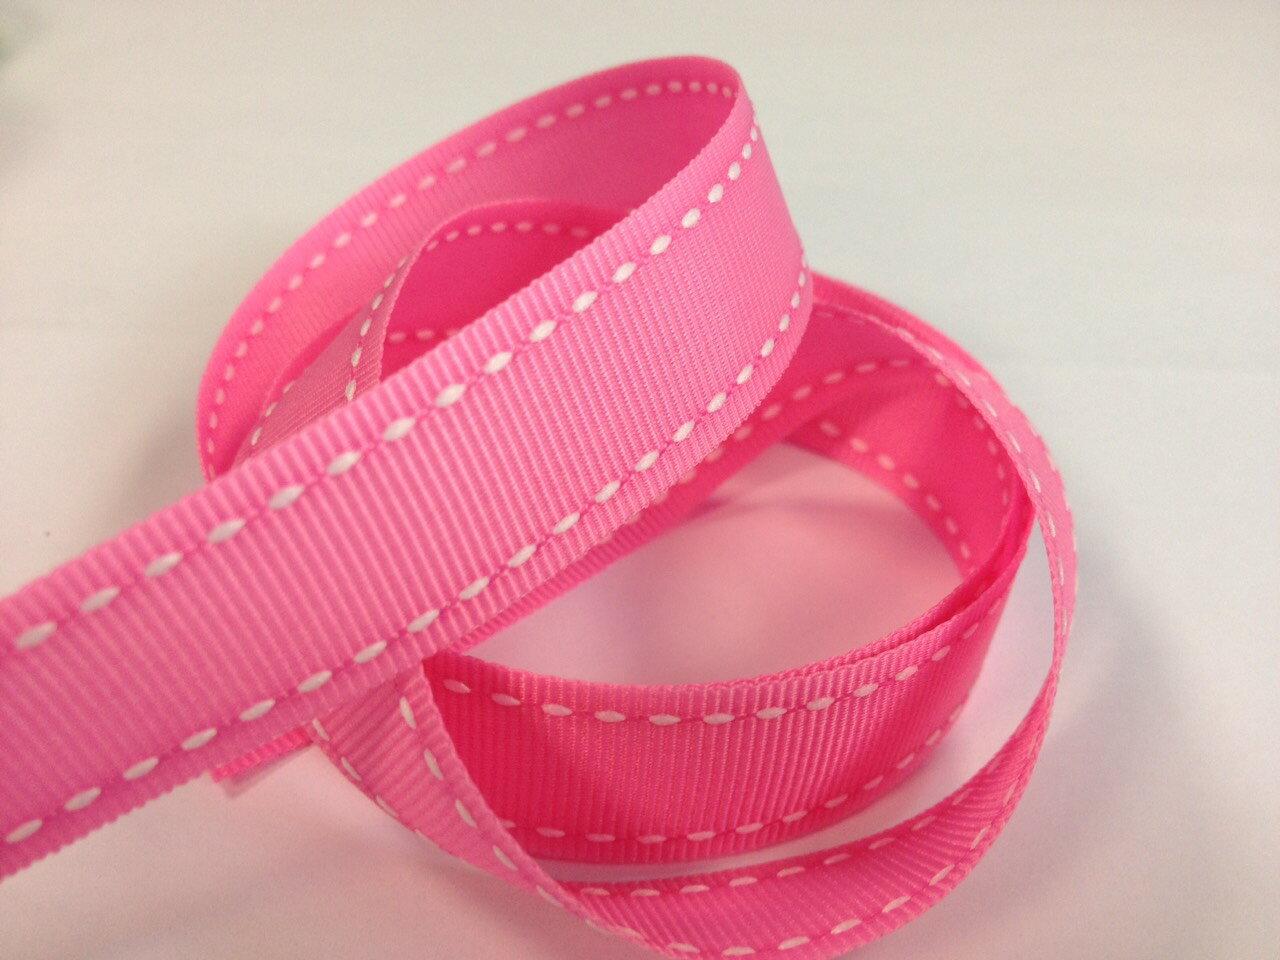 【Crystal Rose緞帶專賣店】橫紋縫線帶-15mm(十五色) 1